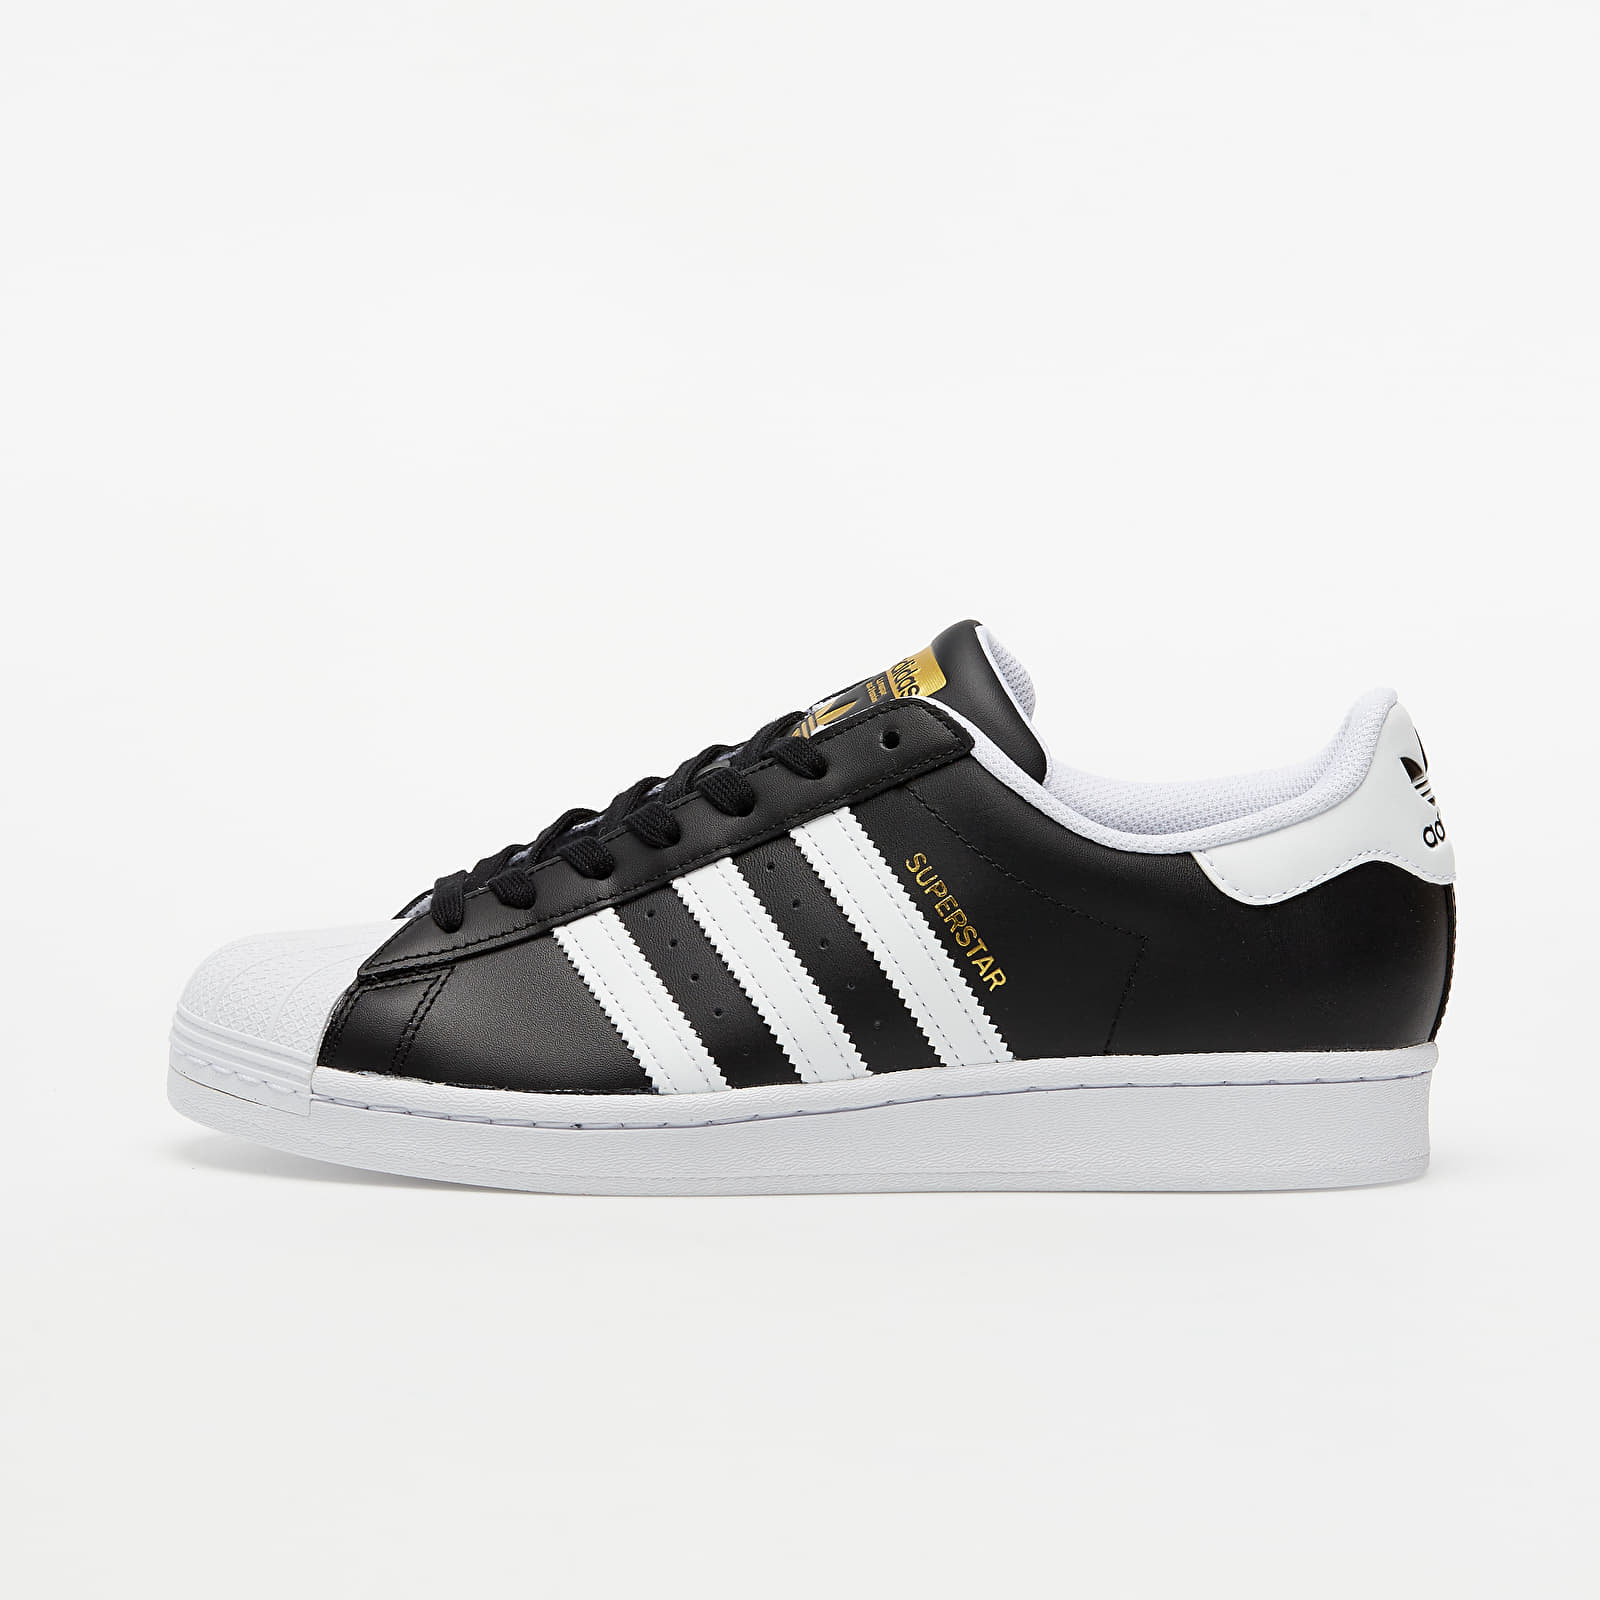 adidas Superstar Core Black/ Ftw White/ Gold Metalic FX2331